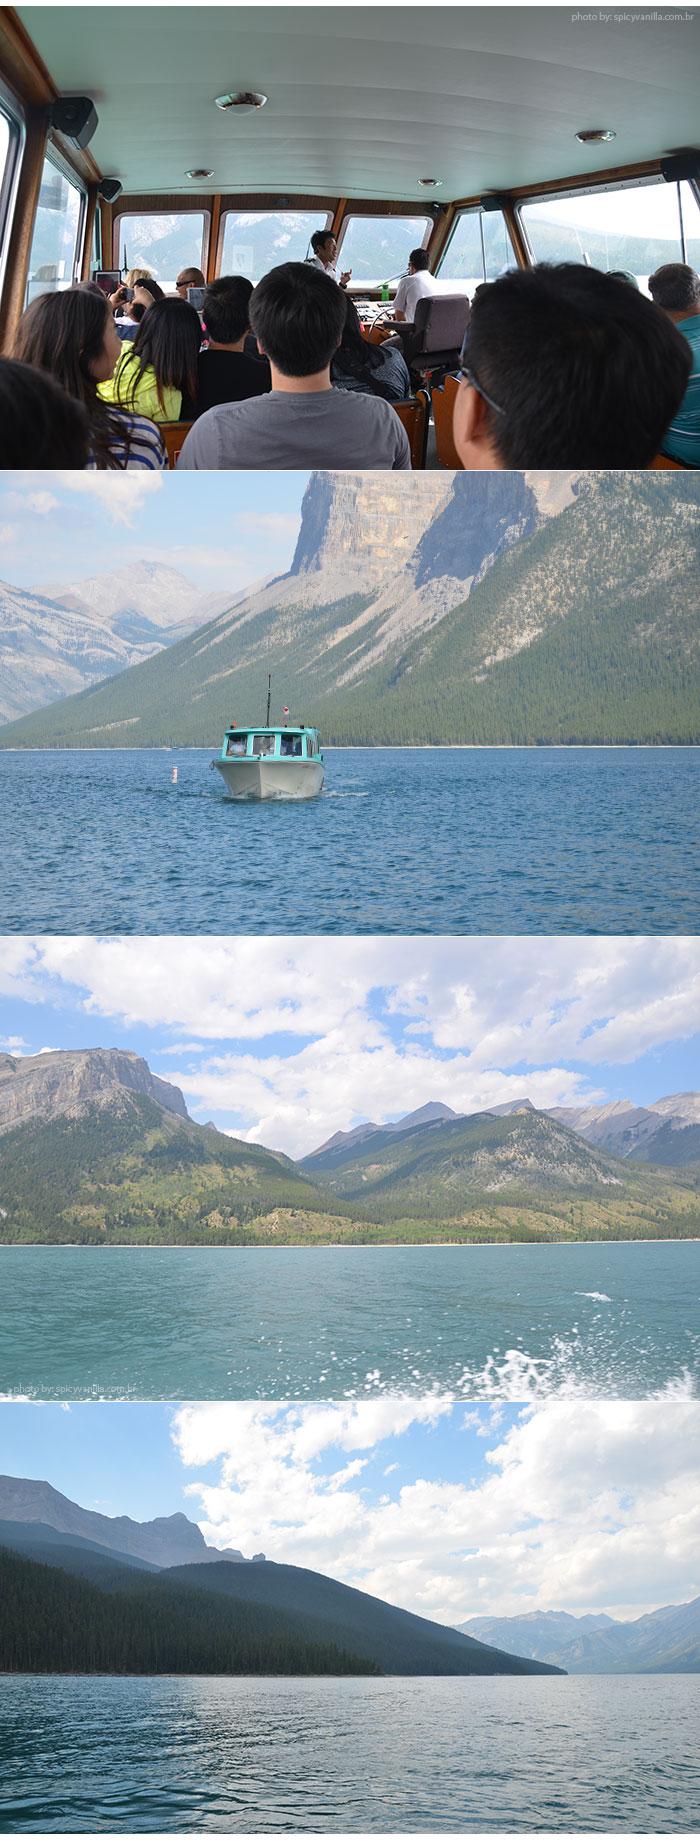 lake_Minnewanka_passeio-barco